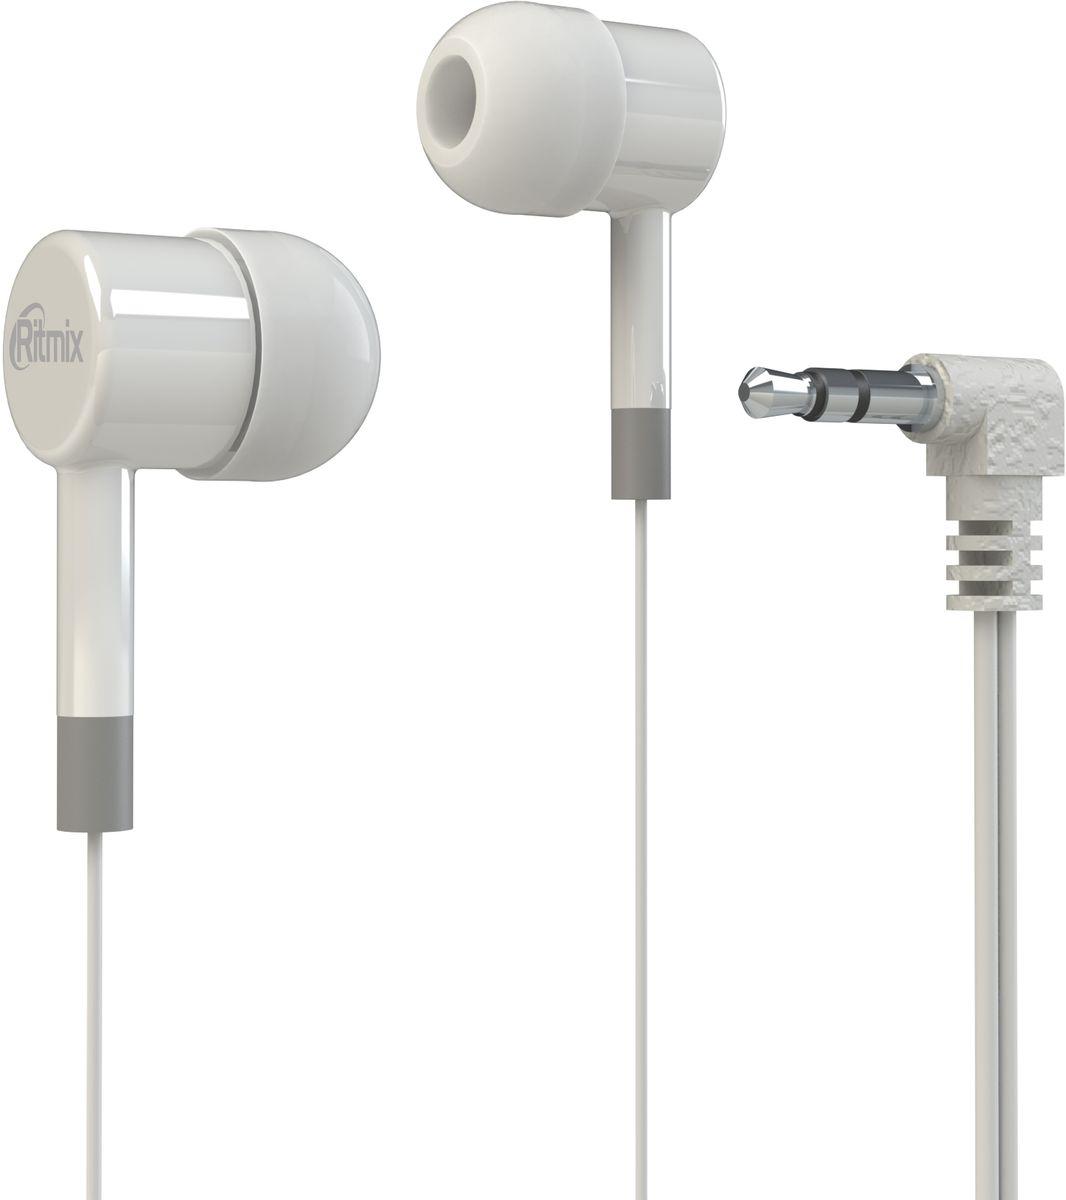 Ritmix RH-003, White наушники аудио наушники ritmix гарнитуры ritmix rh 565m gaming